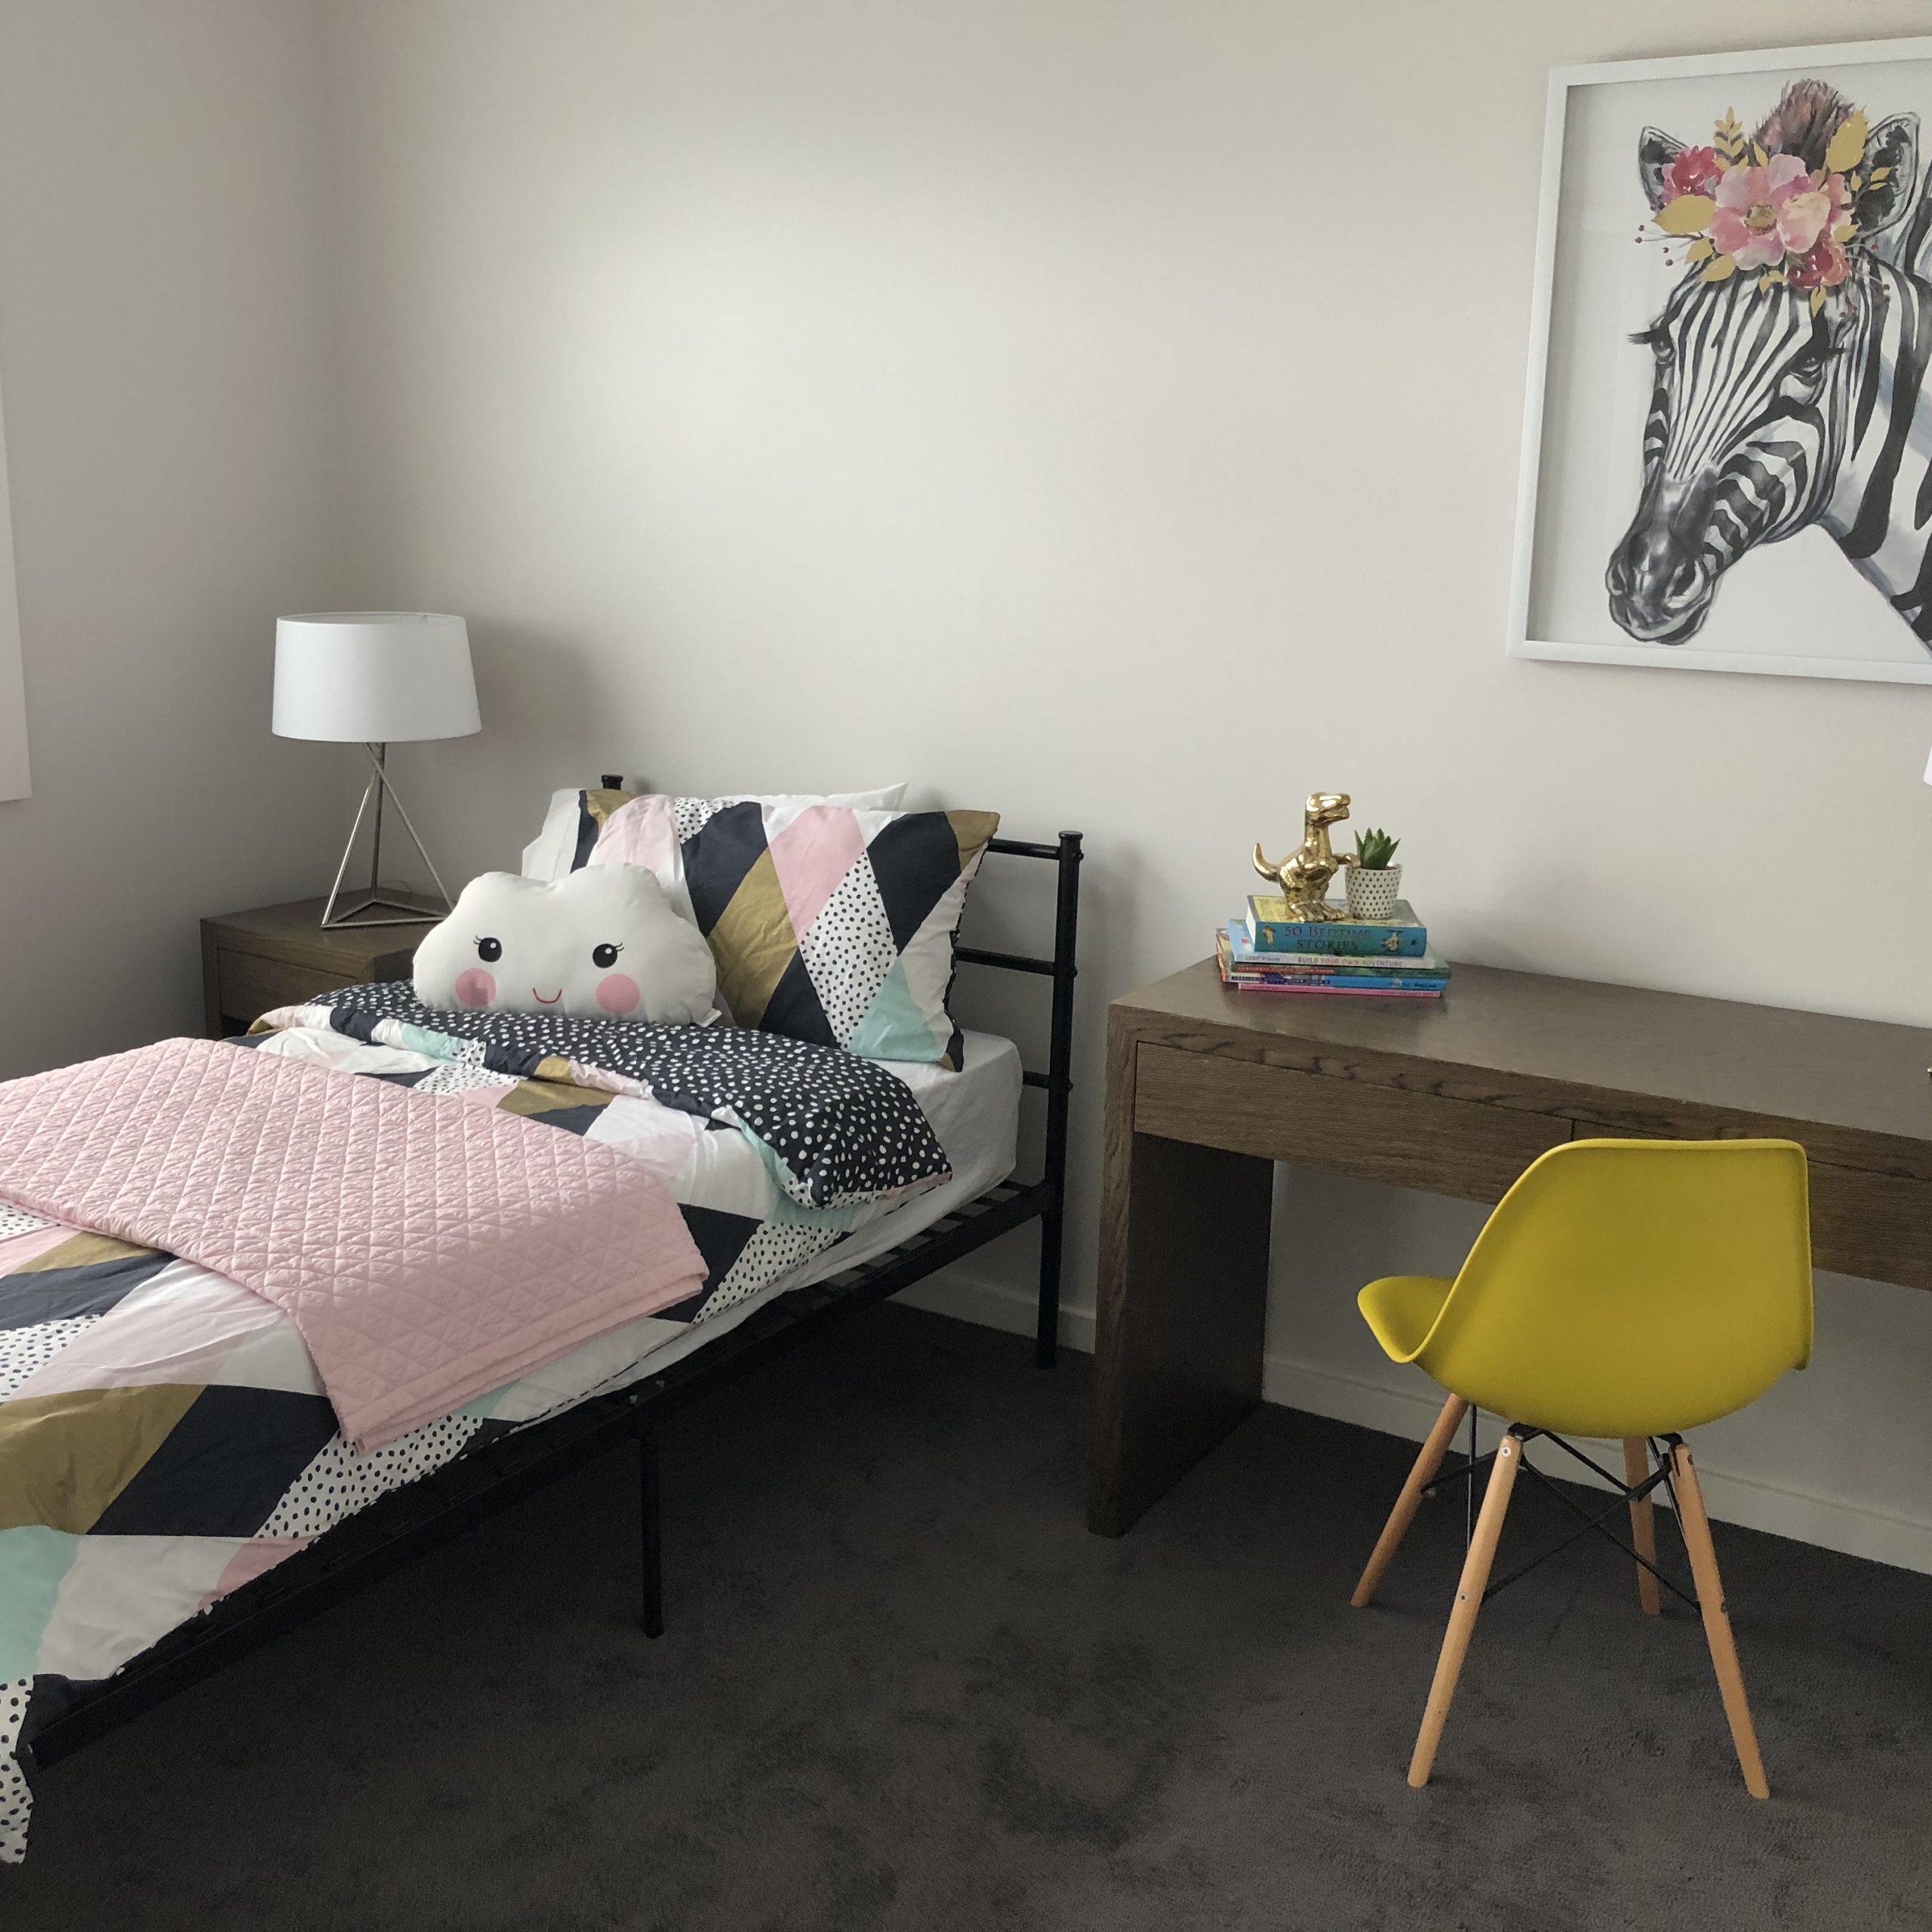 children's bedroom - Melbourne Interior Design - Leeder Interiors